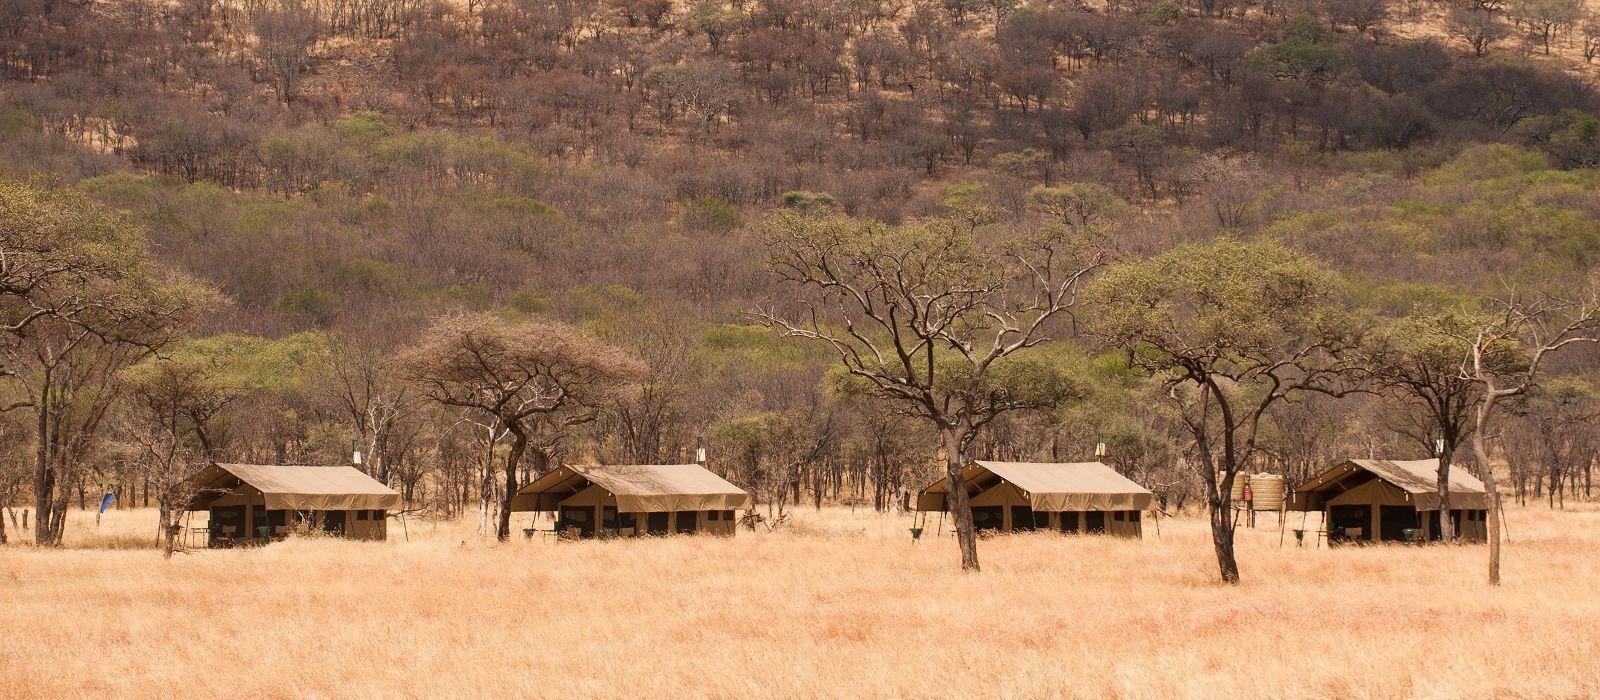 Hotel Mara Kati Kati Tented Camp Tansania